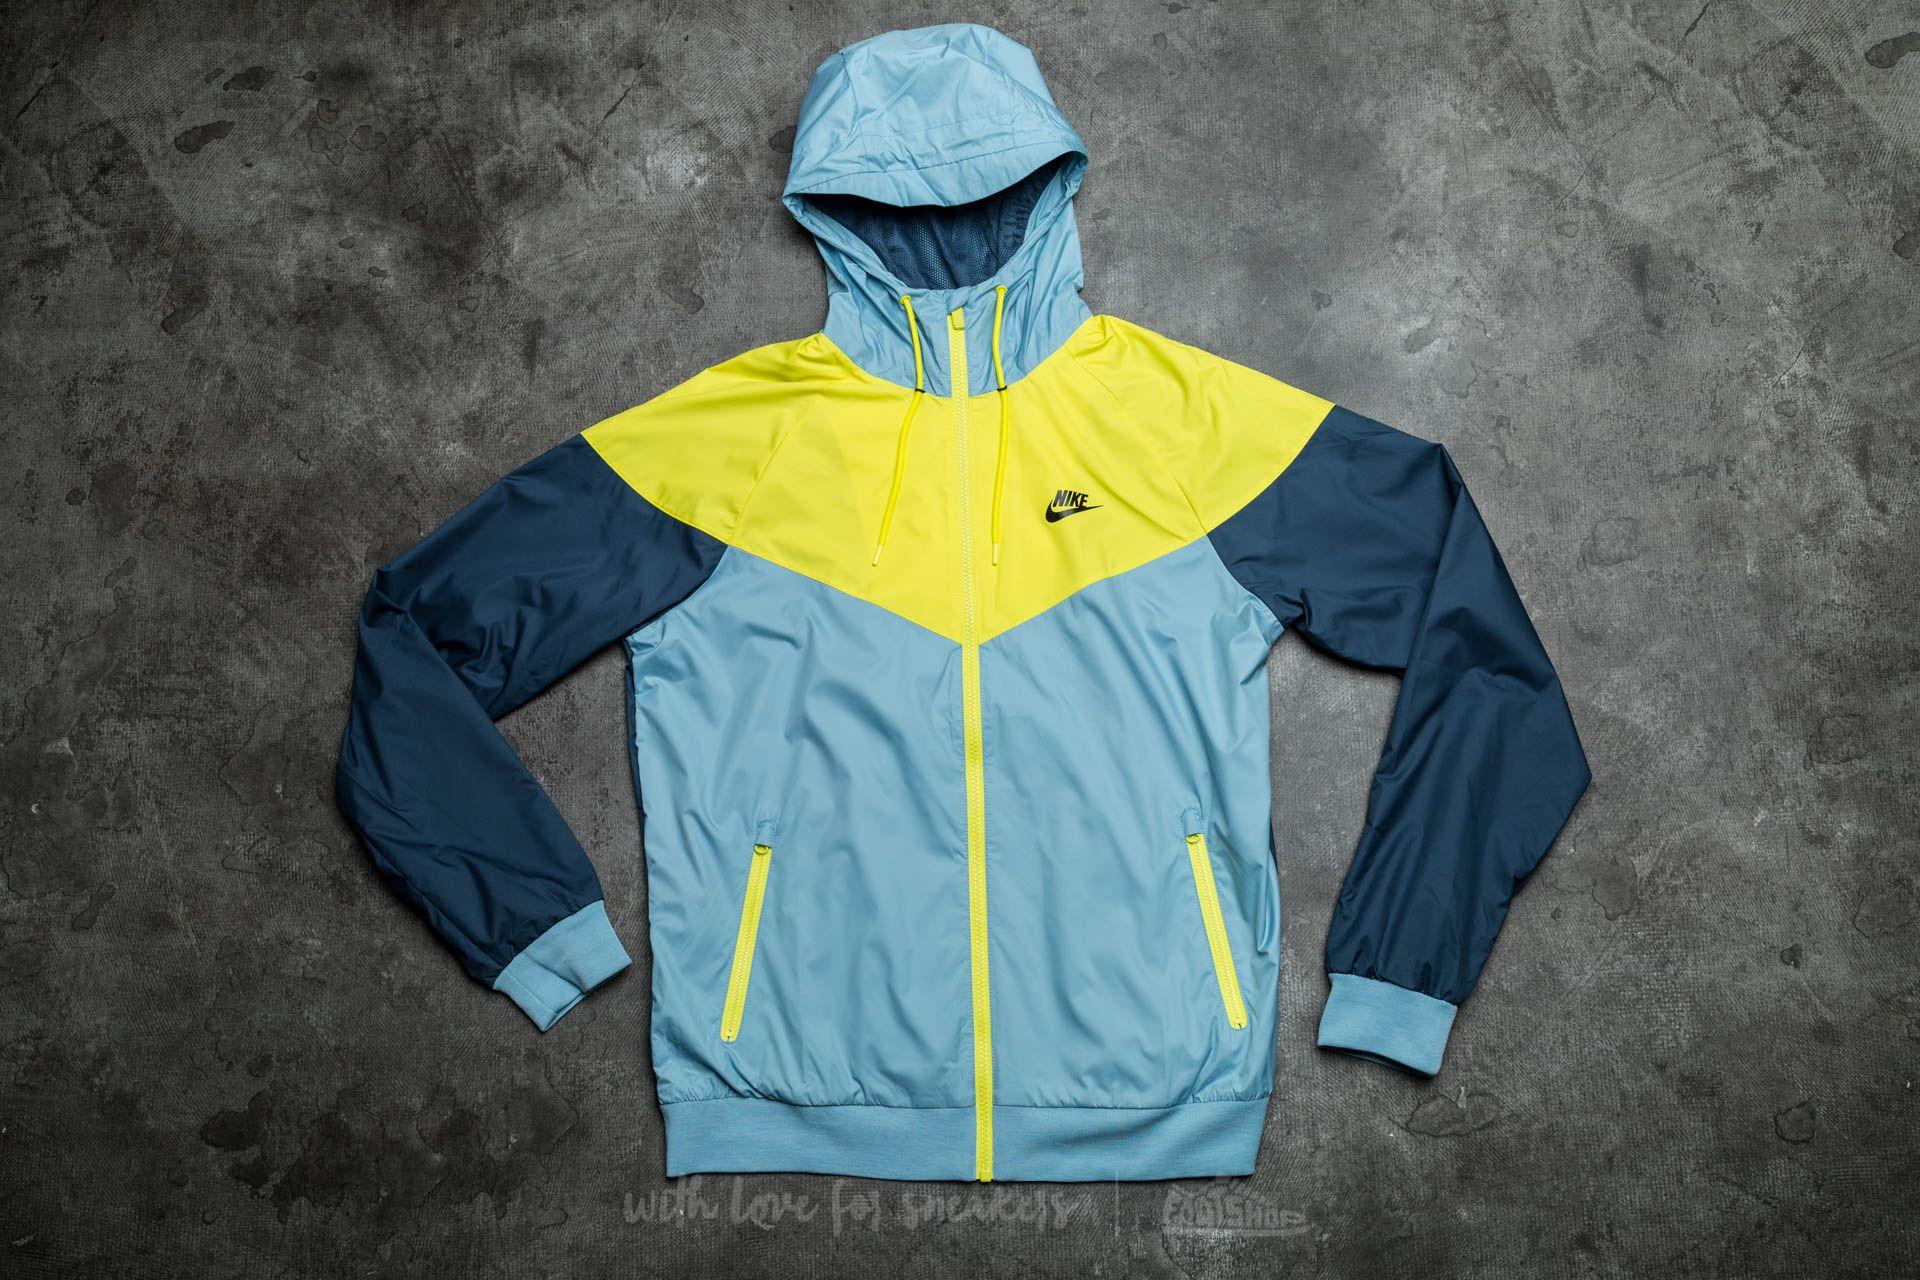 Nike Sportswear Windrunner Mica Blue/ Electrolime/ Squadron Blue/ Black